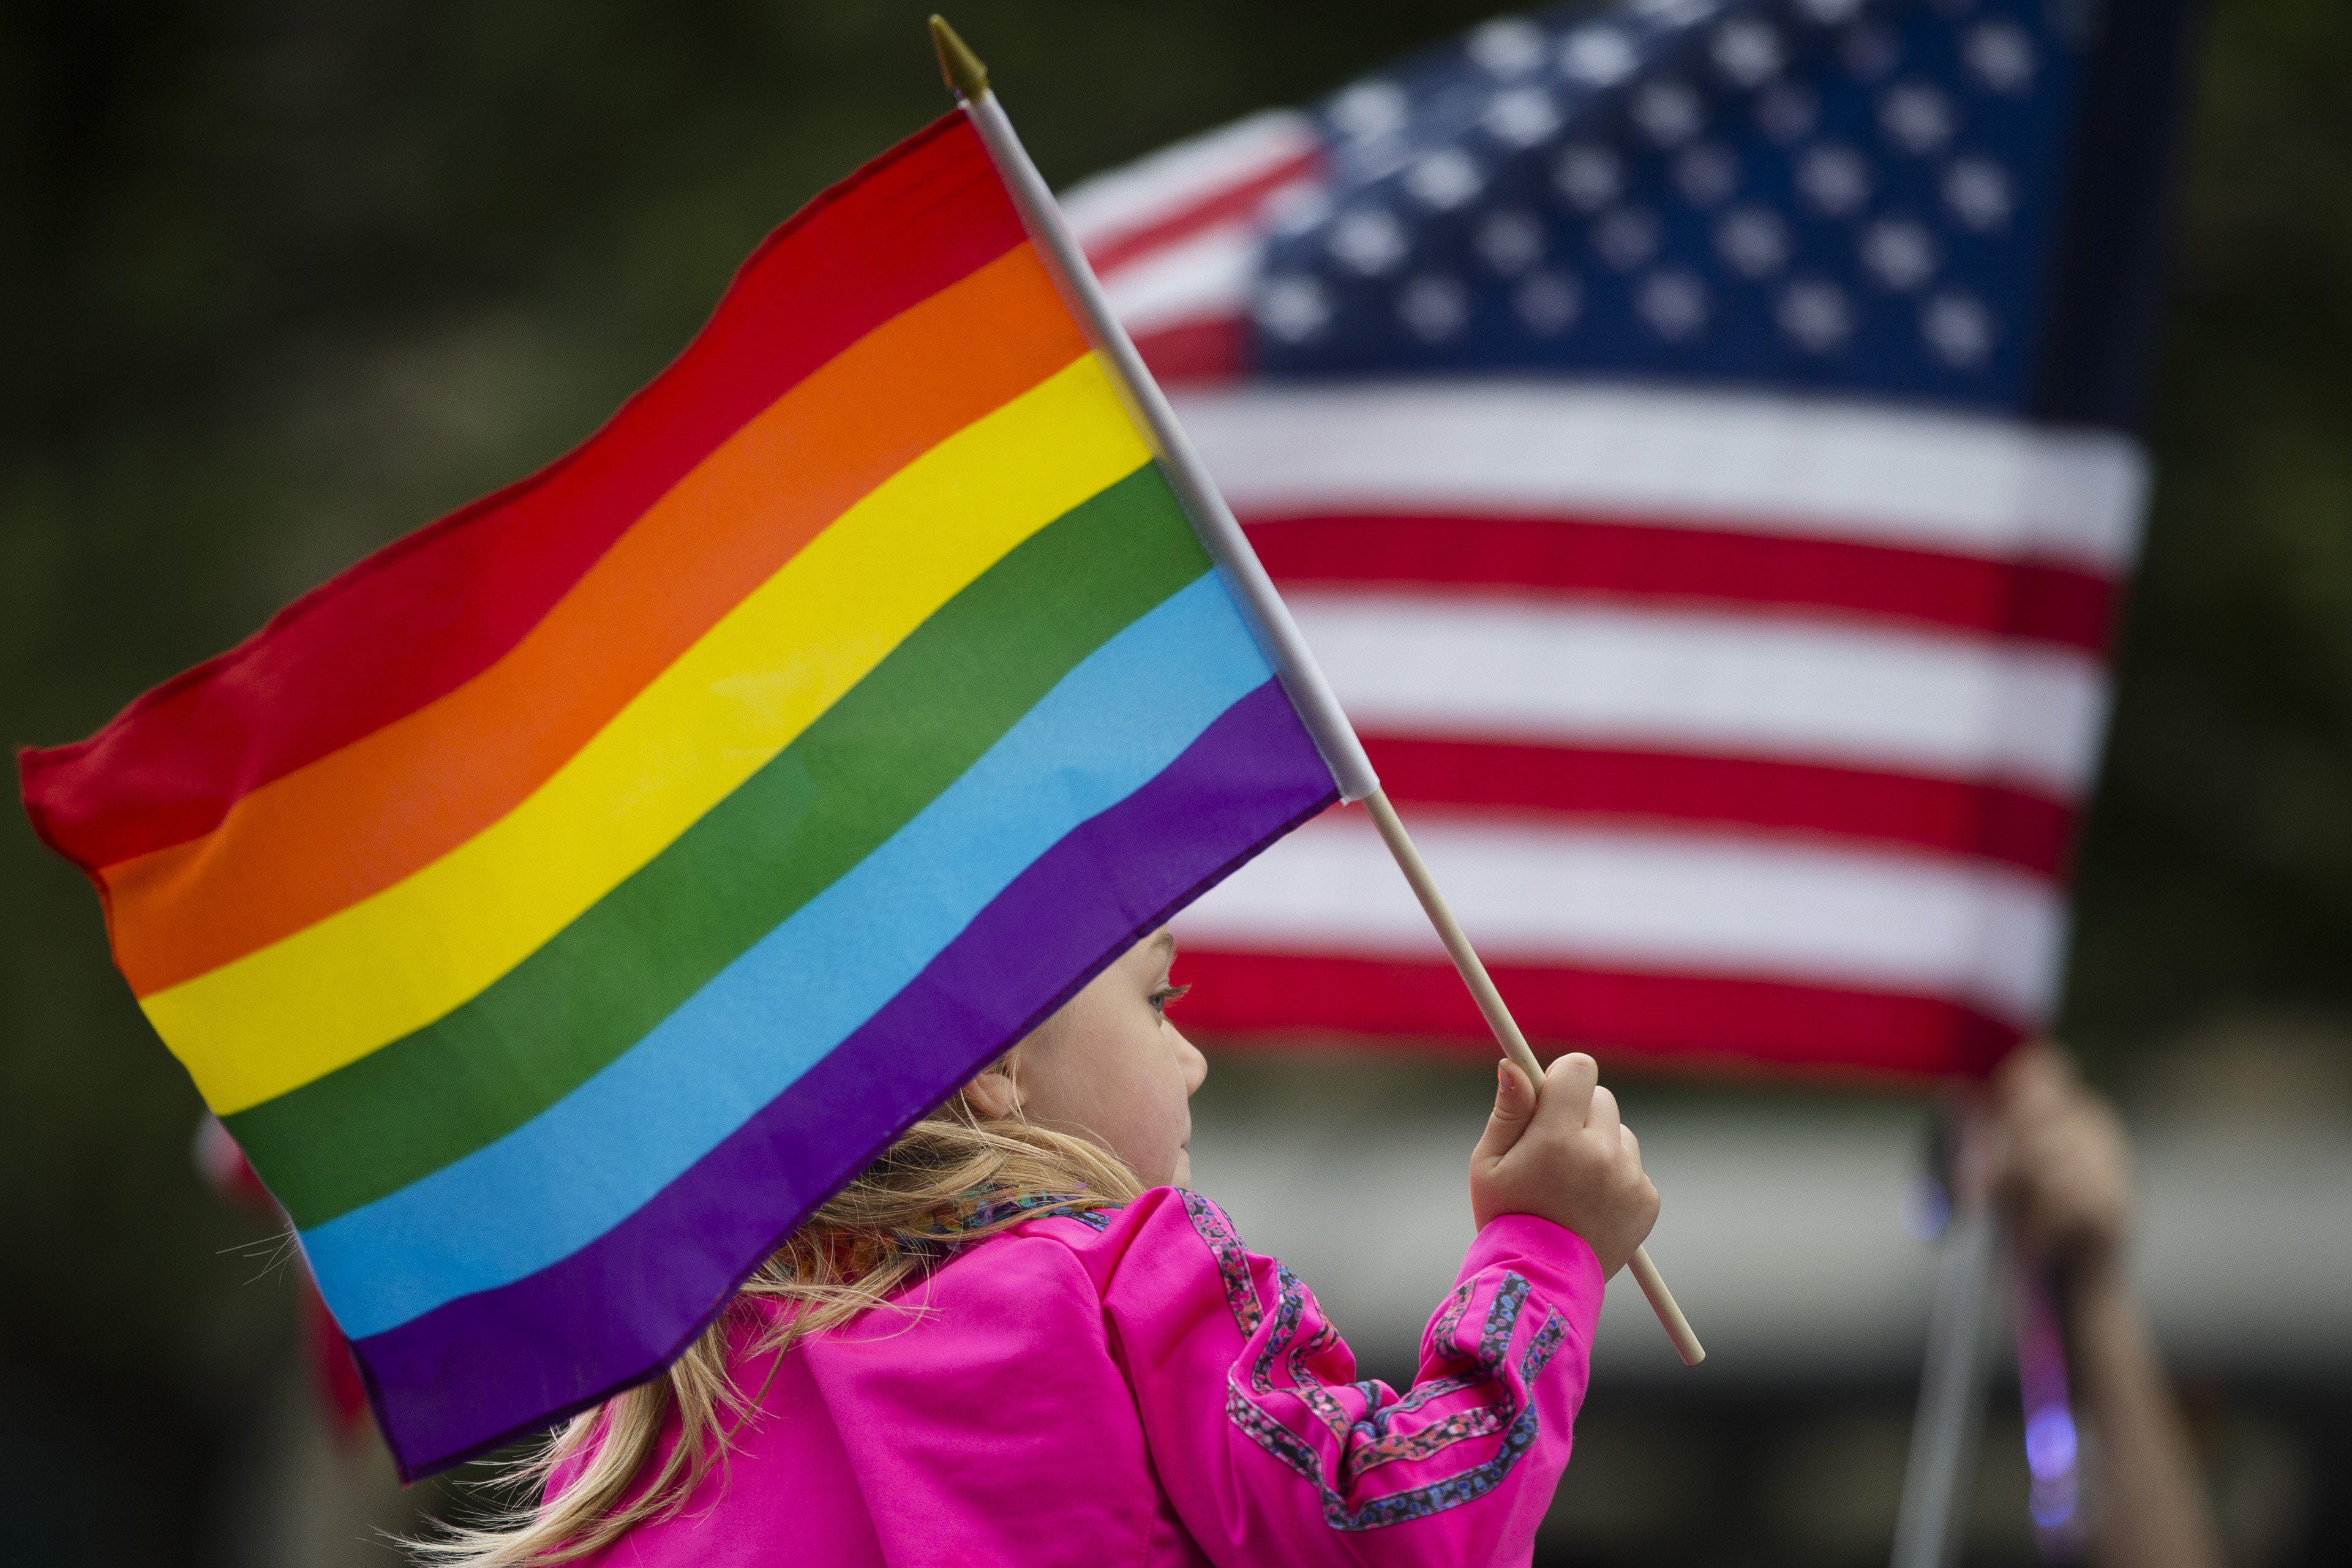 Keira Phair, of Westchester, Ohio, holds a rainbow flag during the Cincinnati Pride parade on June 27, 2015, in Cincinnati.